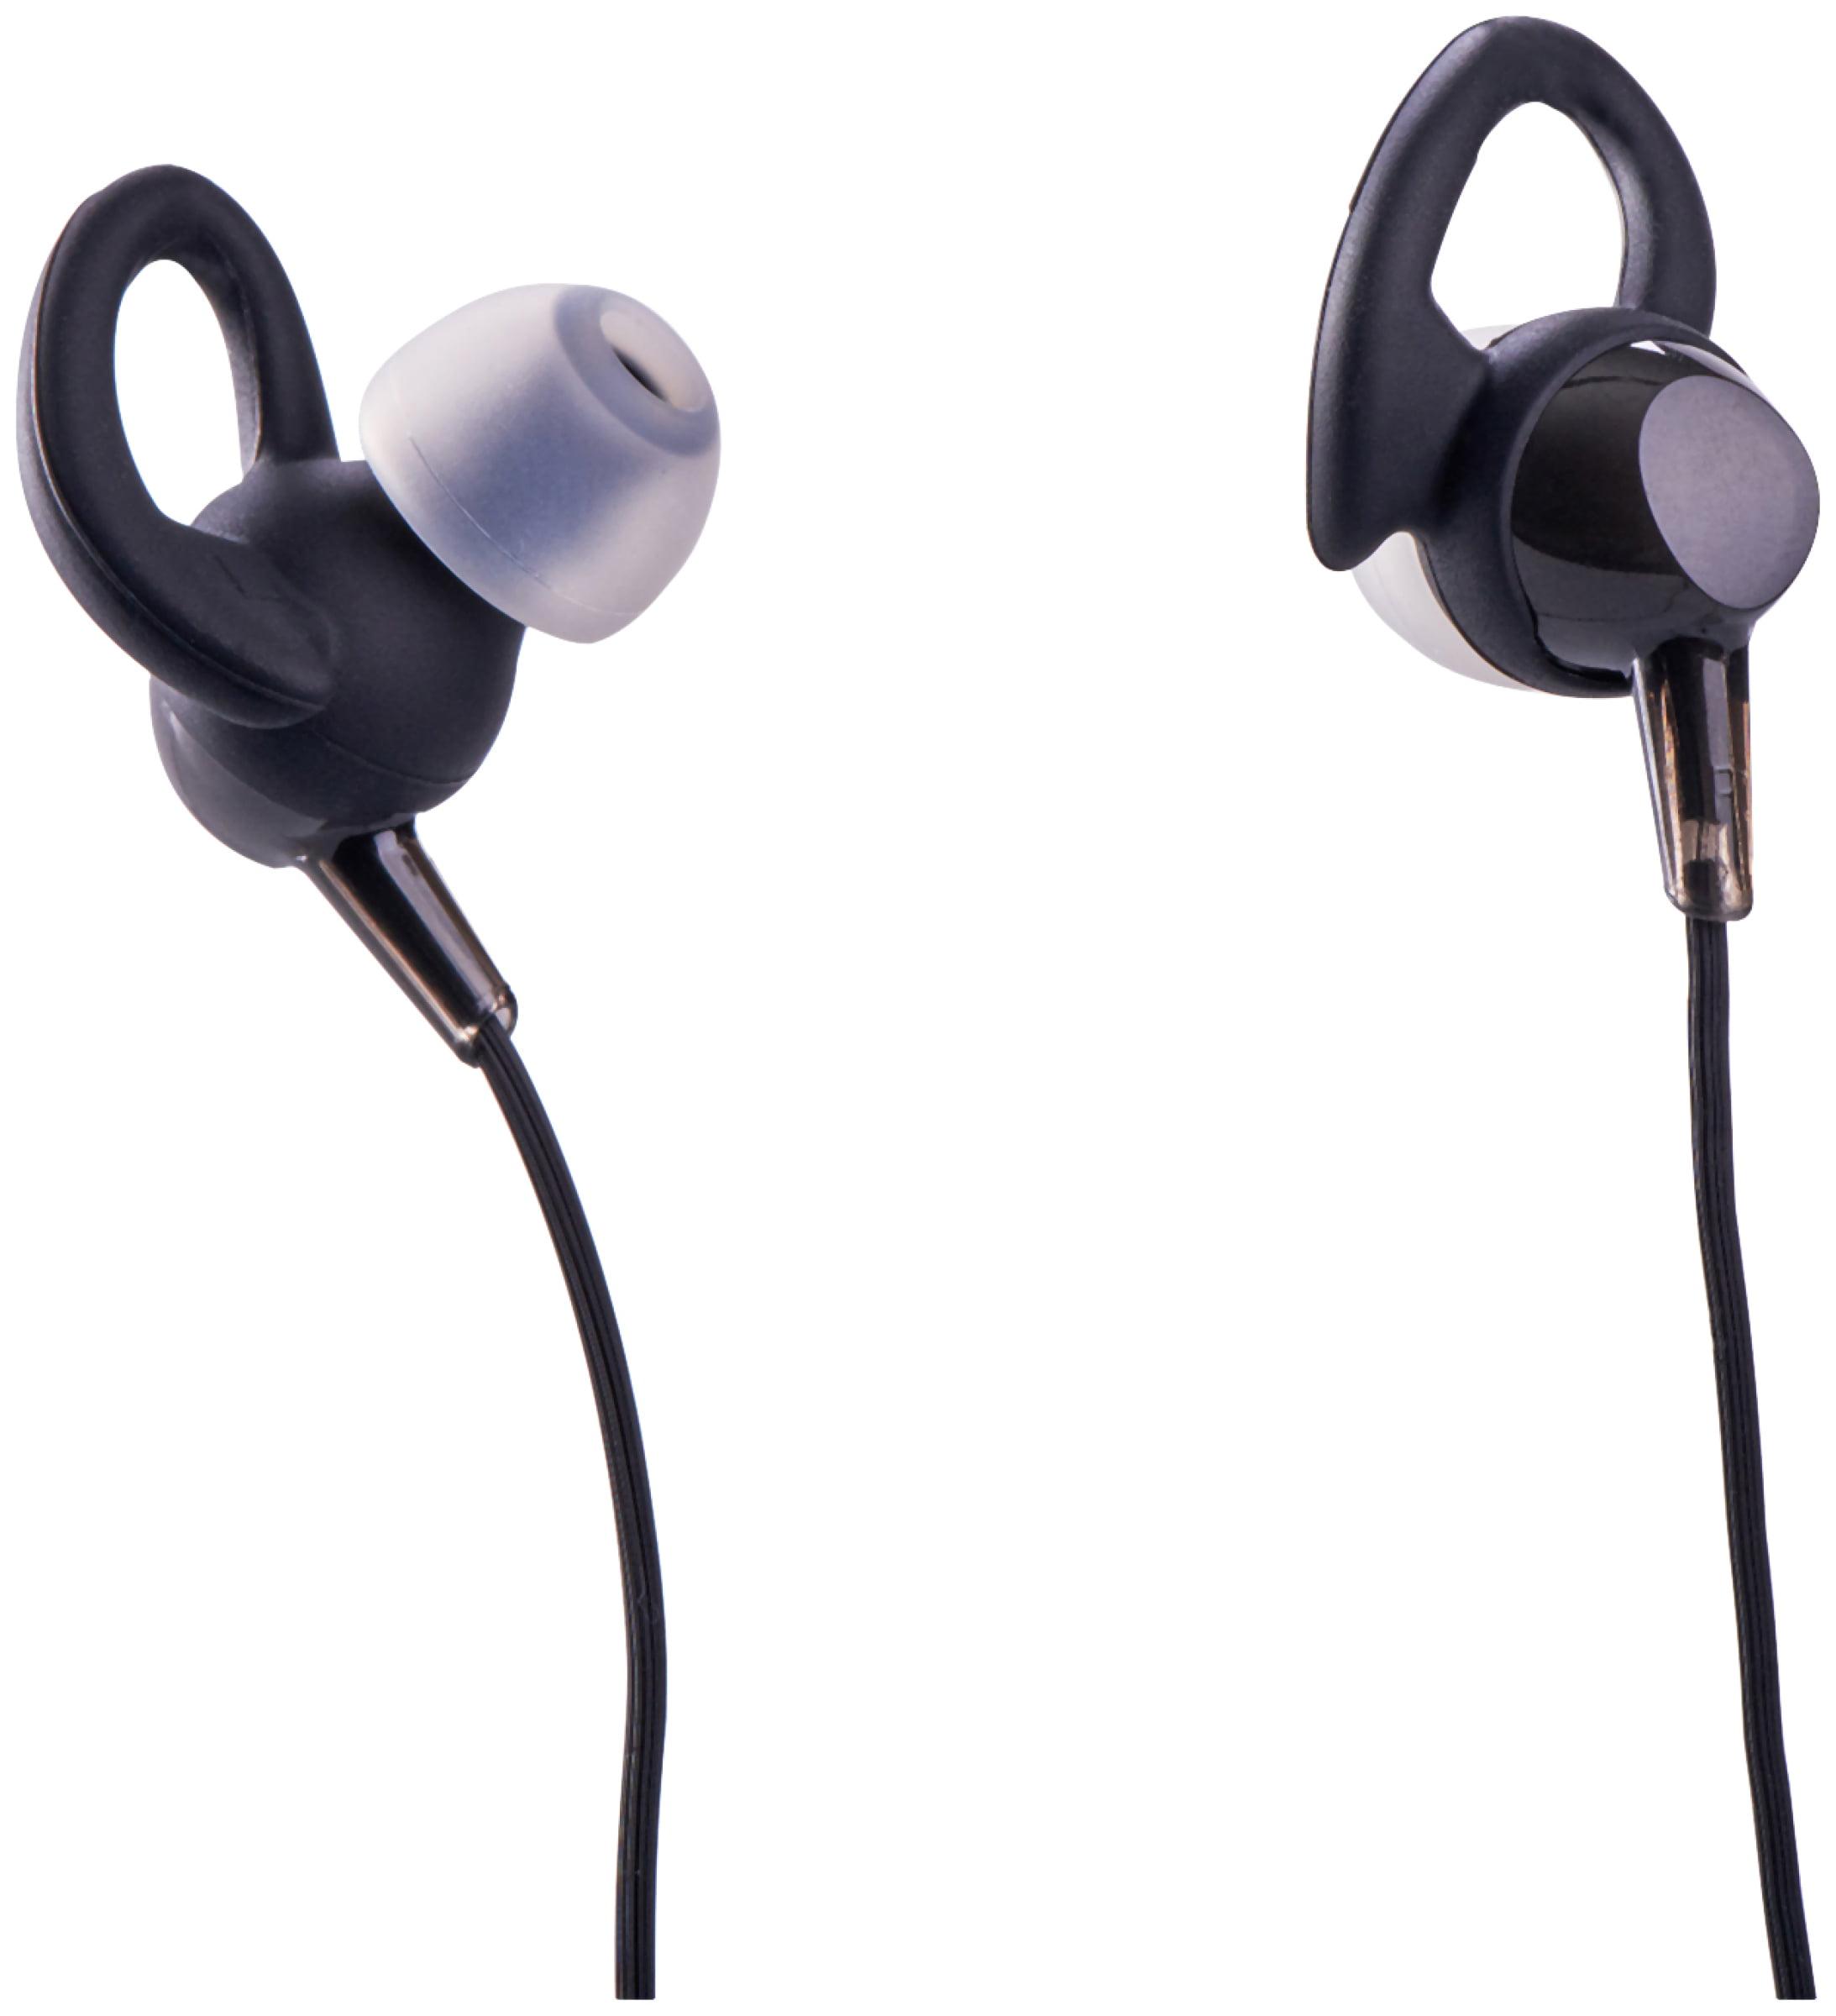 b7bbbff5588 Onn Wireless Earbuds - Pink - Walmart.com